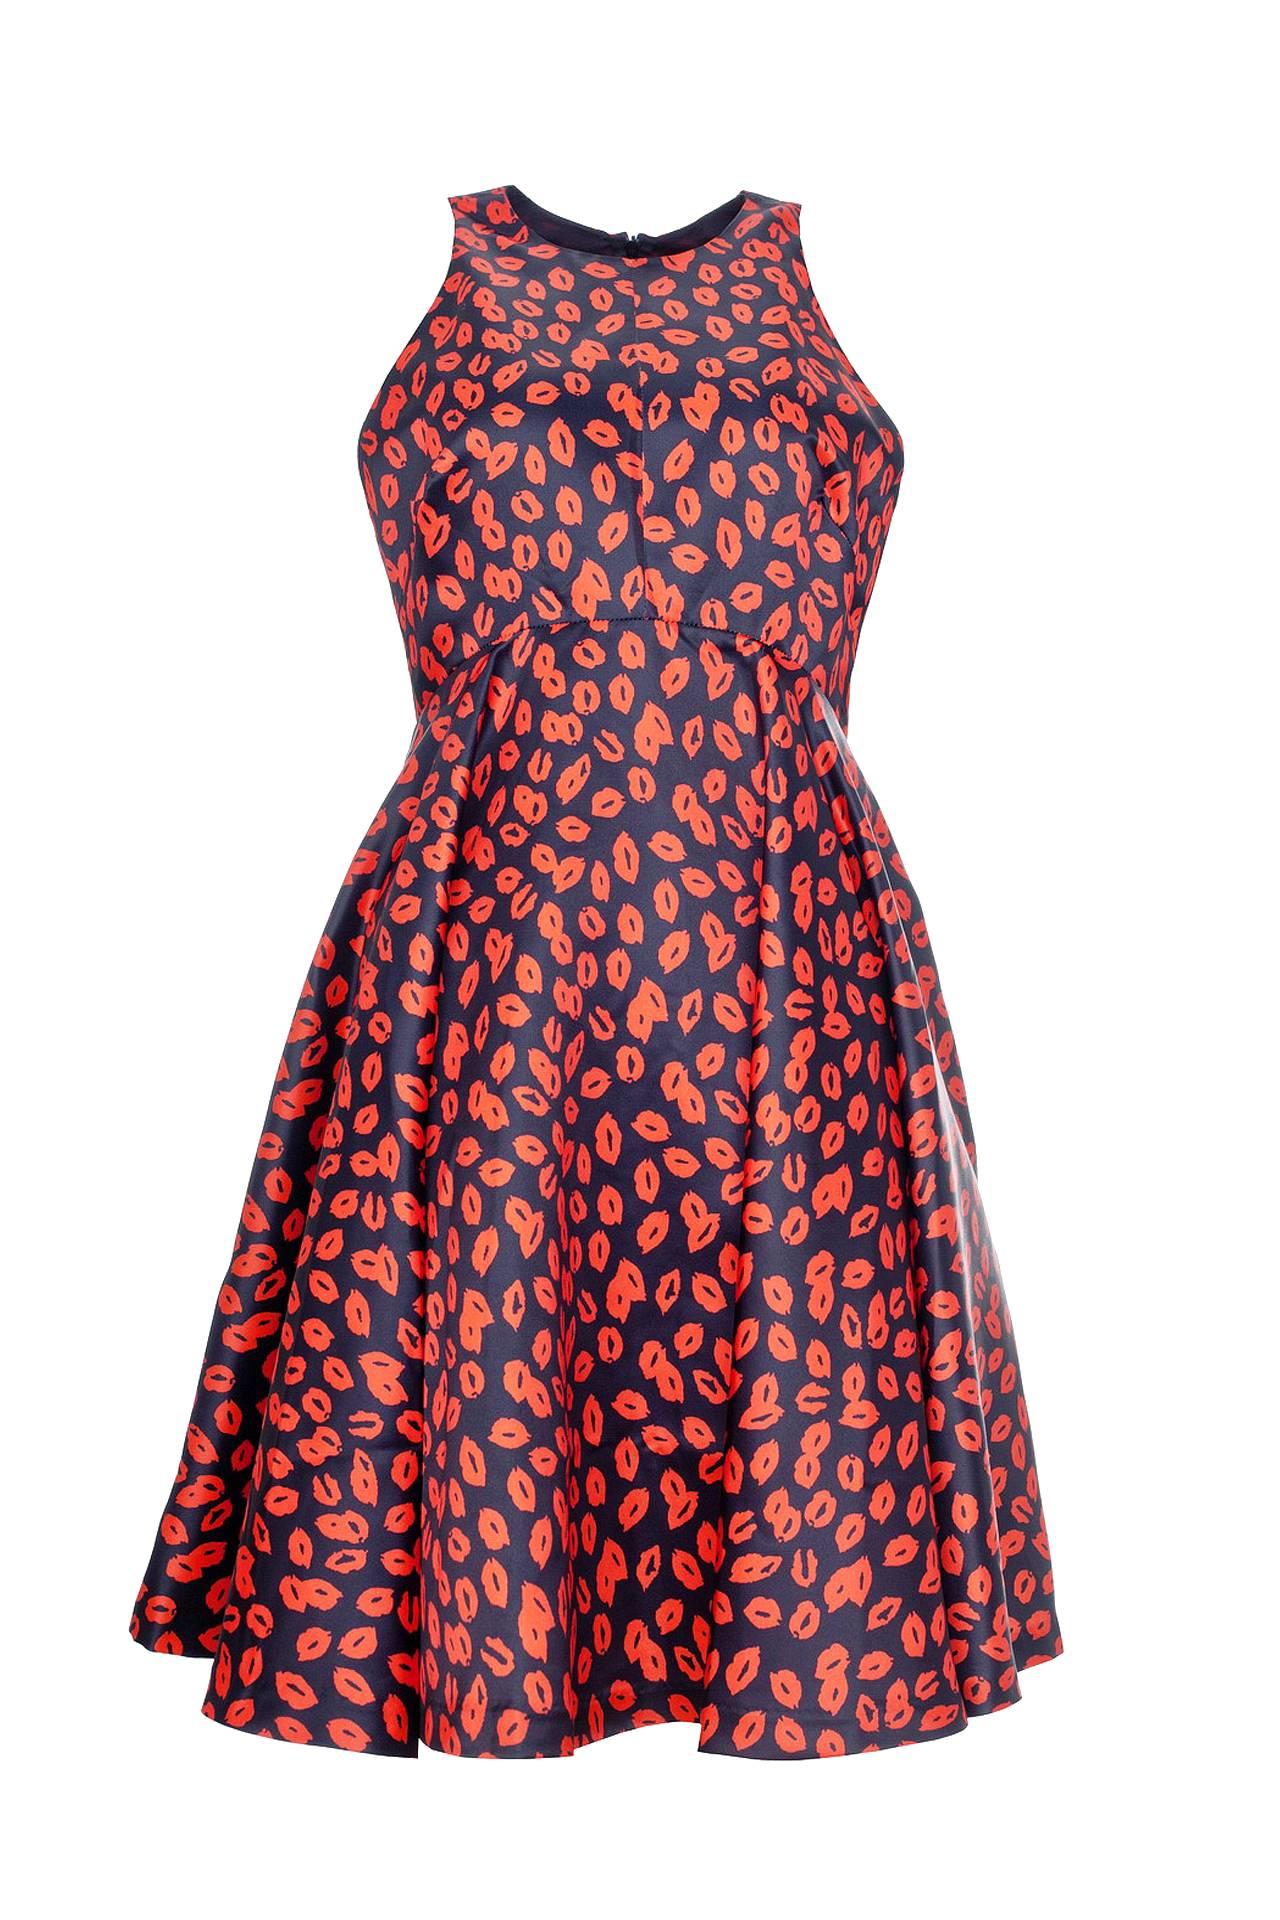 Платье без фона картинки